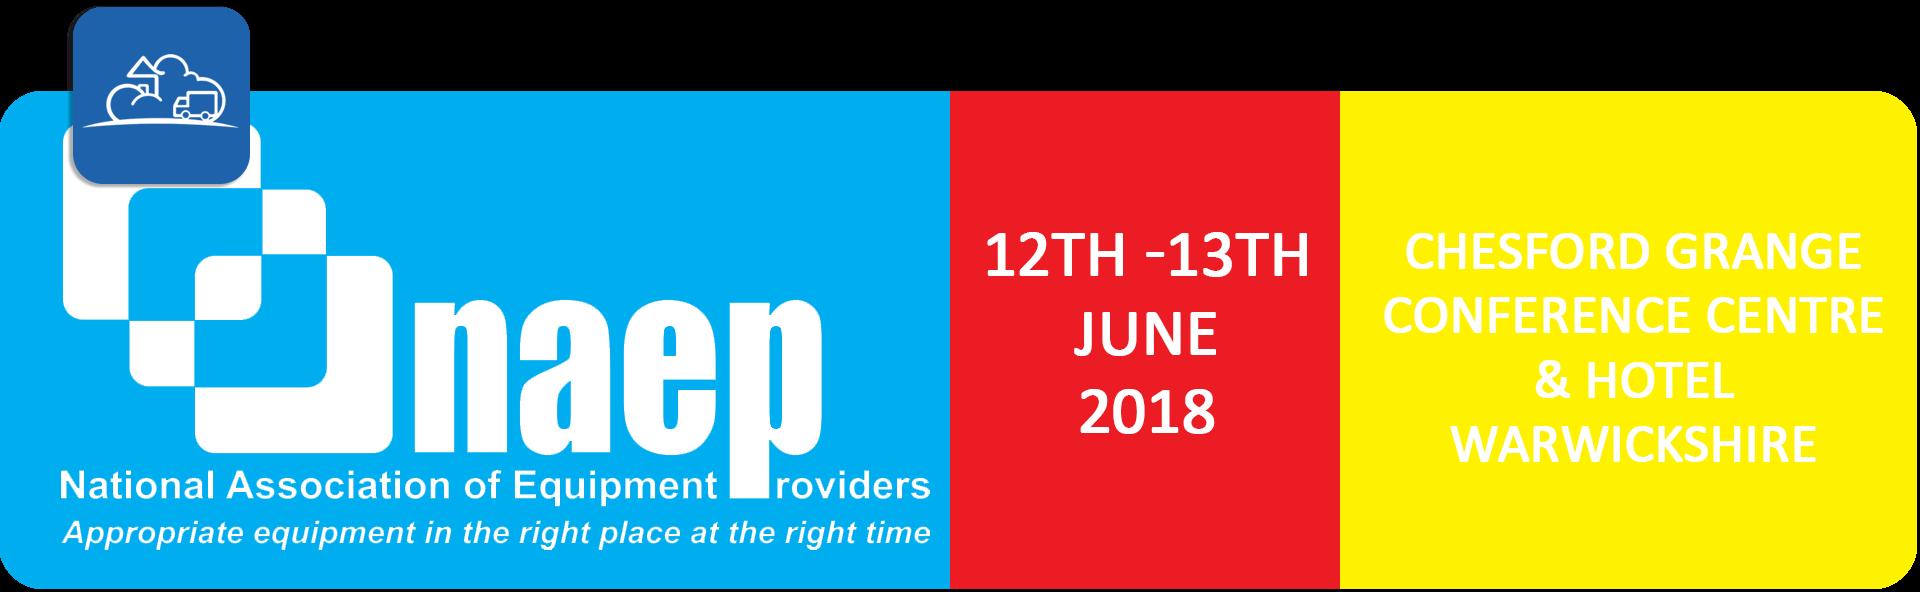 NAEP conference june 2018 banner